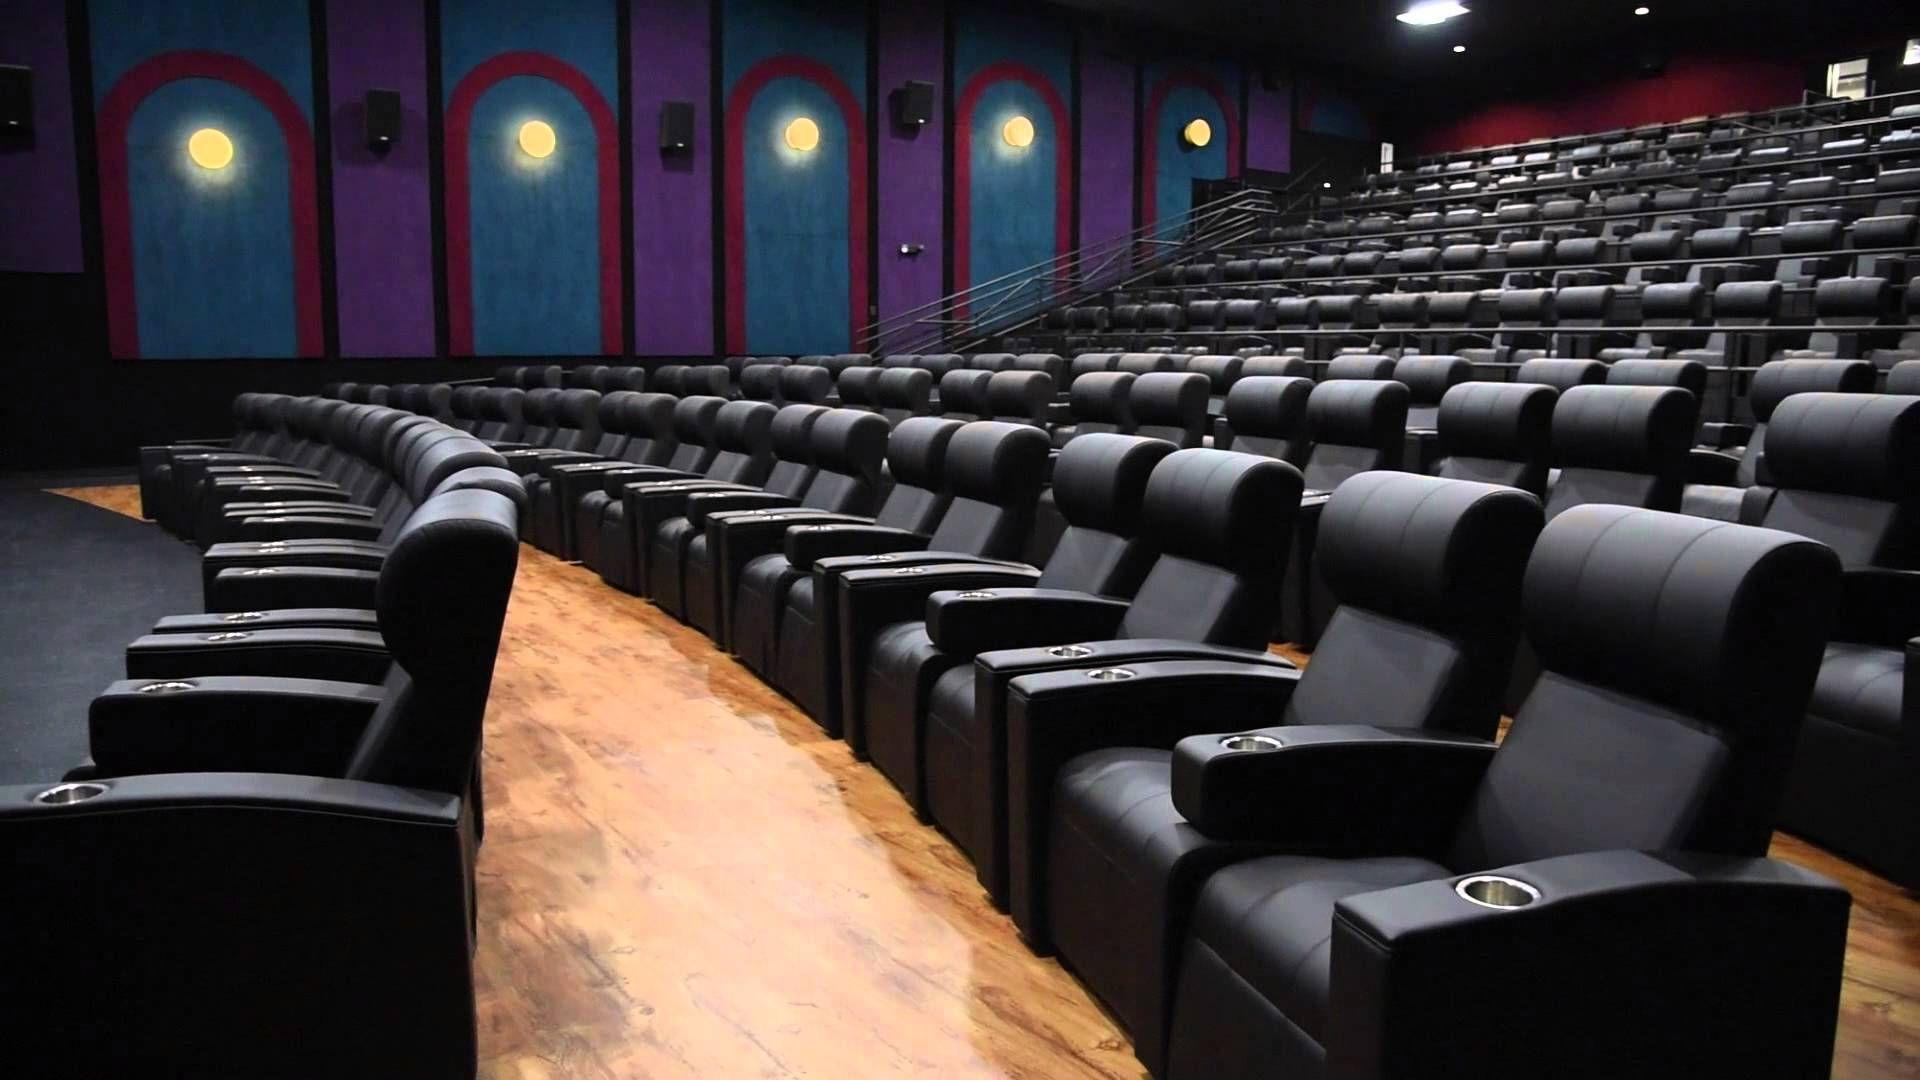 Movie Theater wallpaper theme